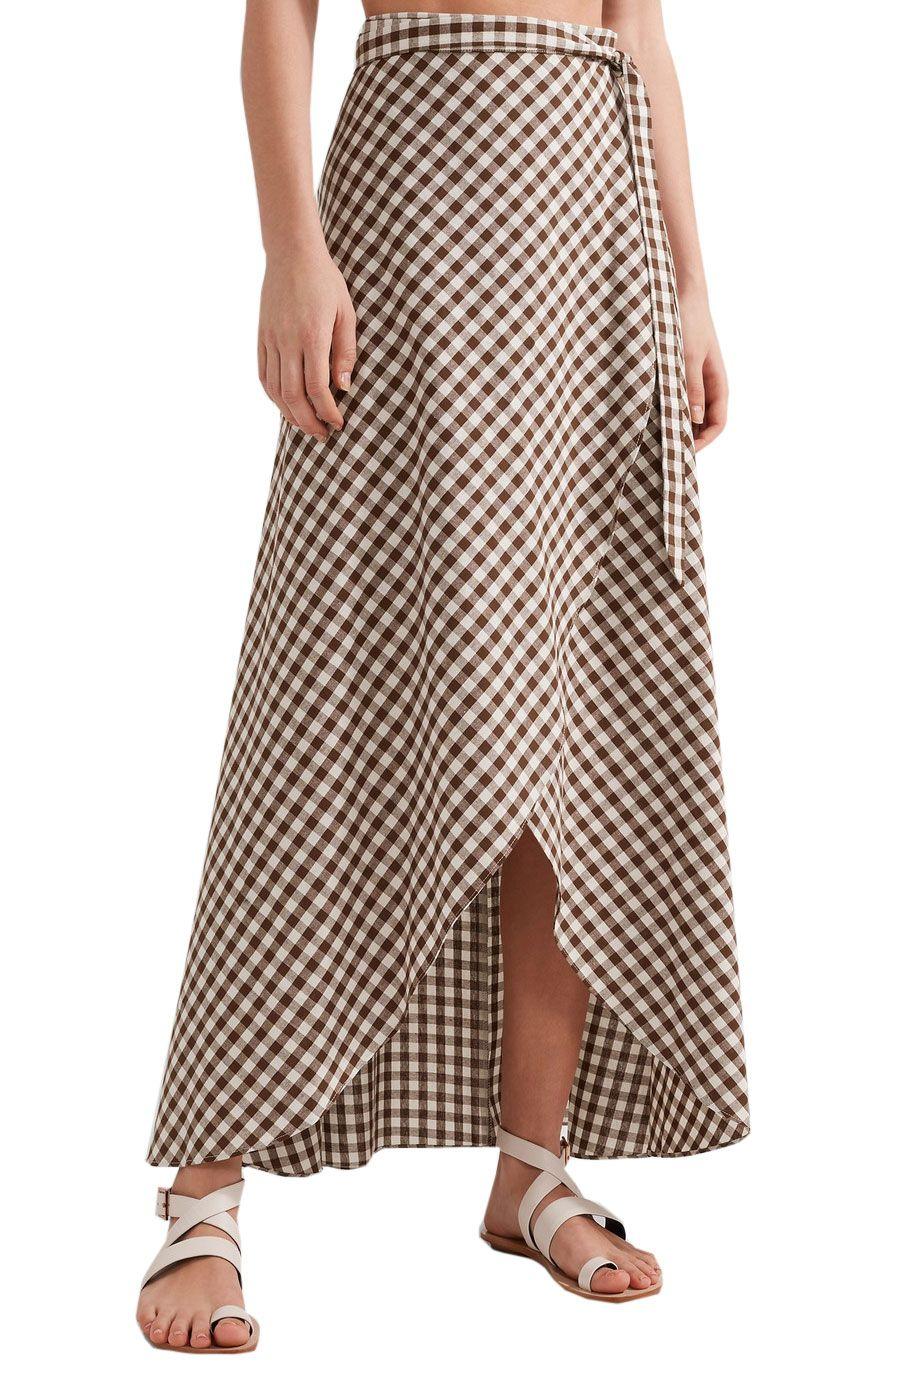 Miguelina Maxi Skirt